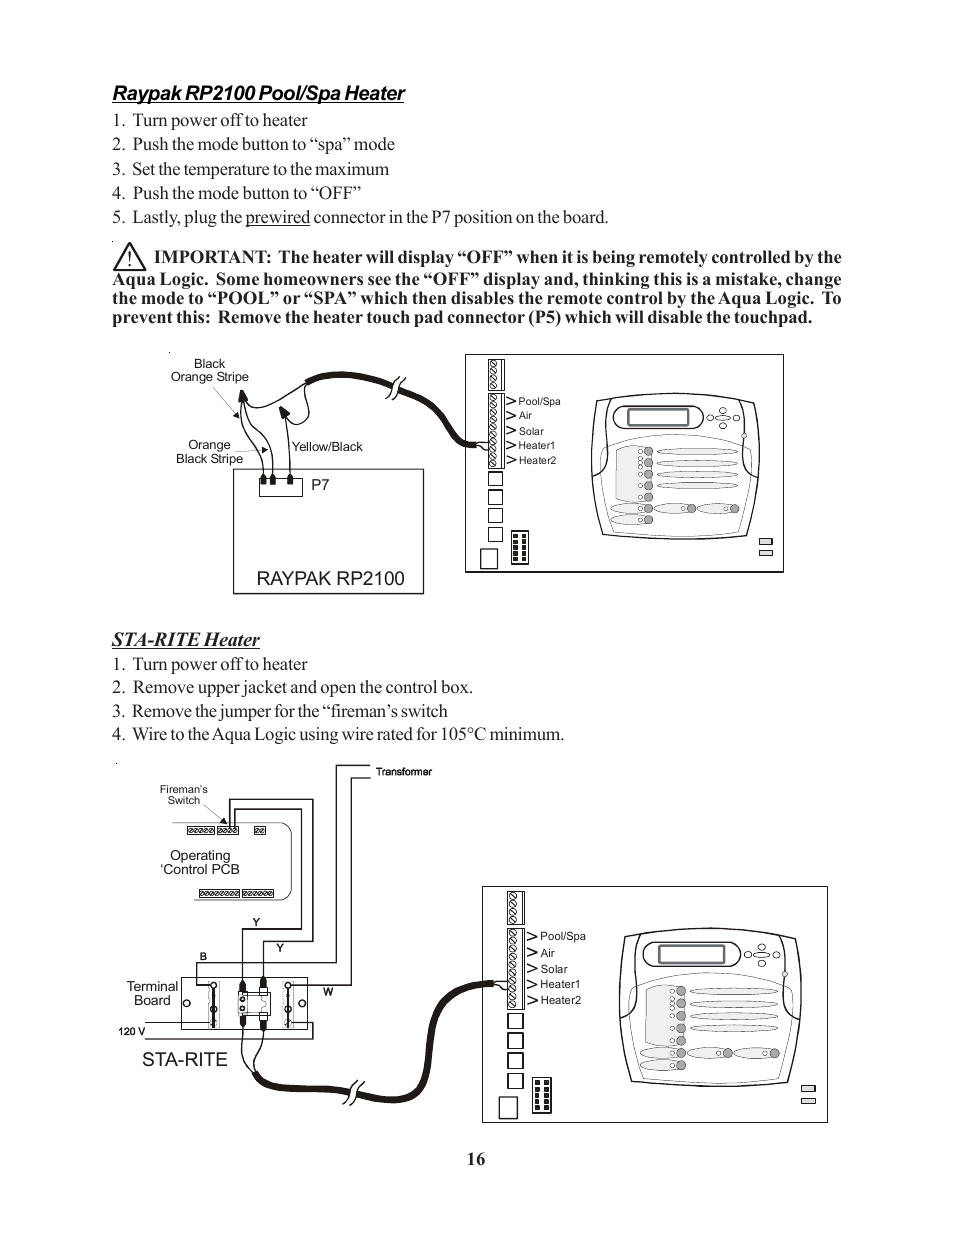 Raypak Remote Wiring Diagram Electrical Diagrams Versa Rp2100 Pool Spa Heater Sta Rite Panasonic